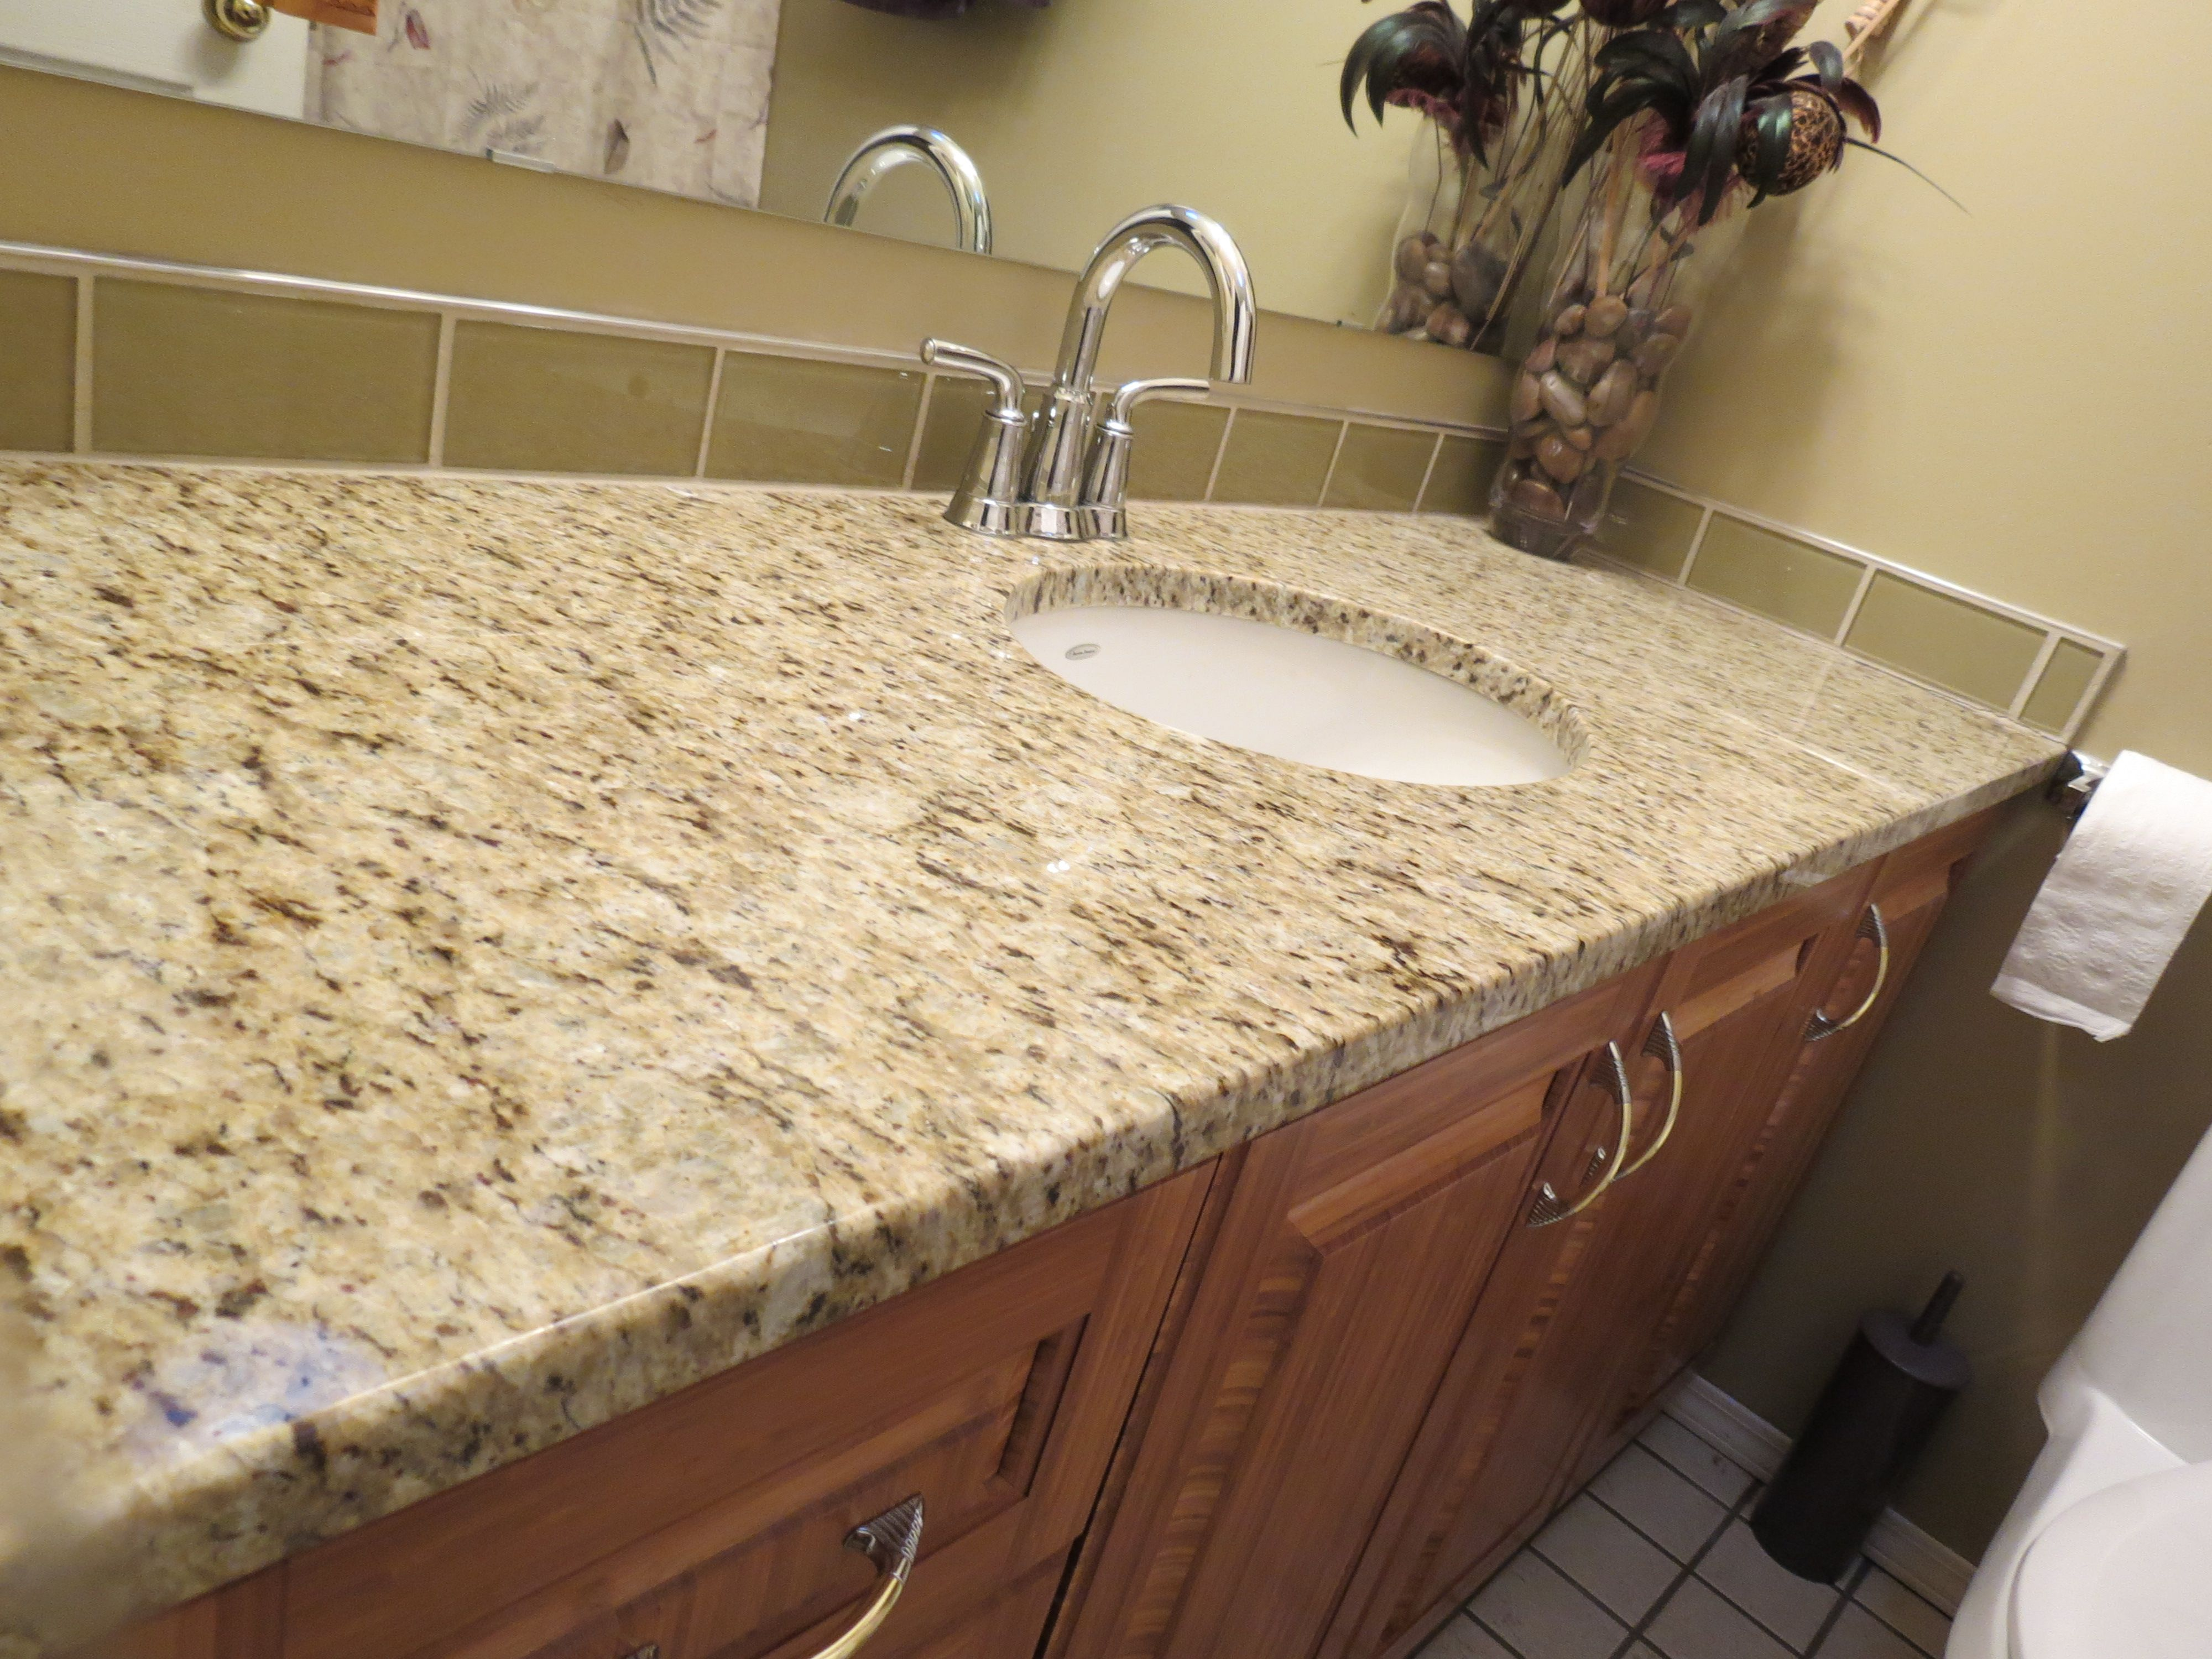 Giallo Ornamental Granite Countertop   Our Master Bath Granite.  BadeværelsesideerBadeværelsesrenovering